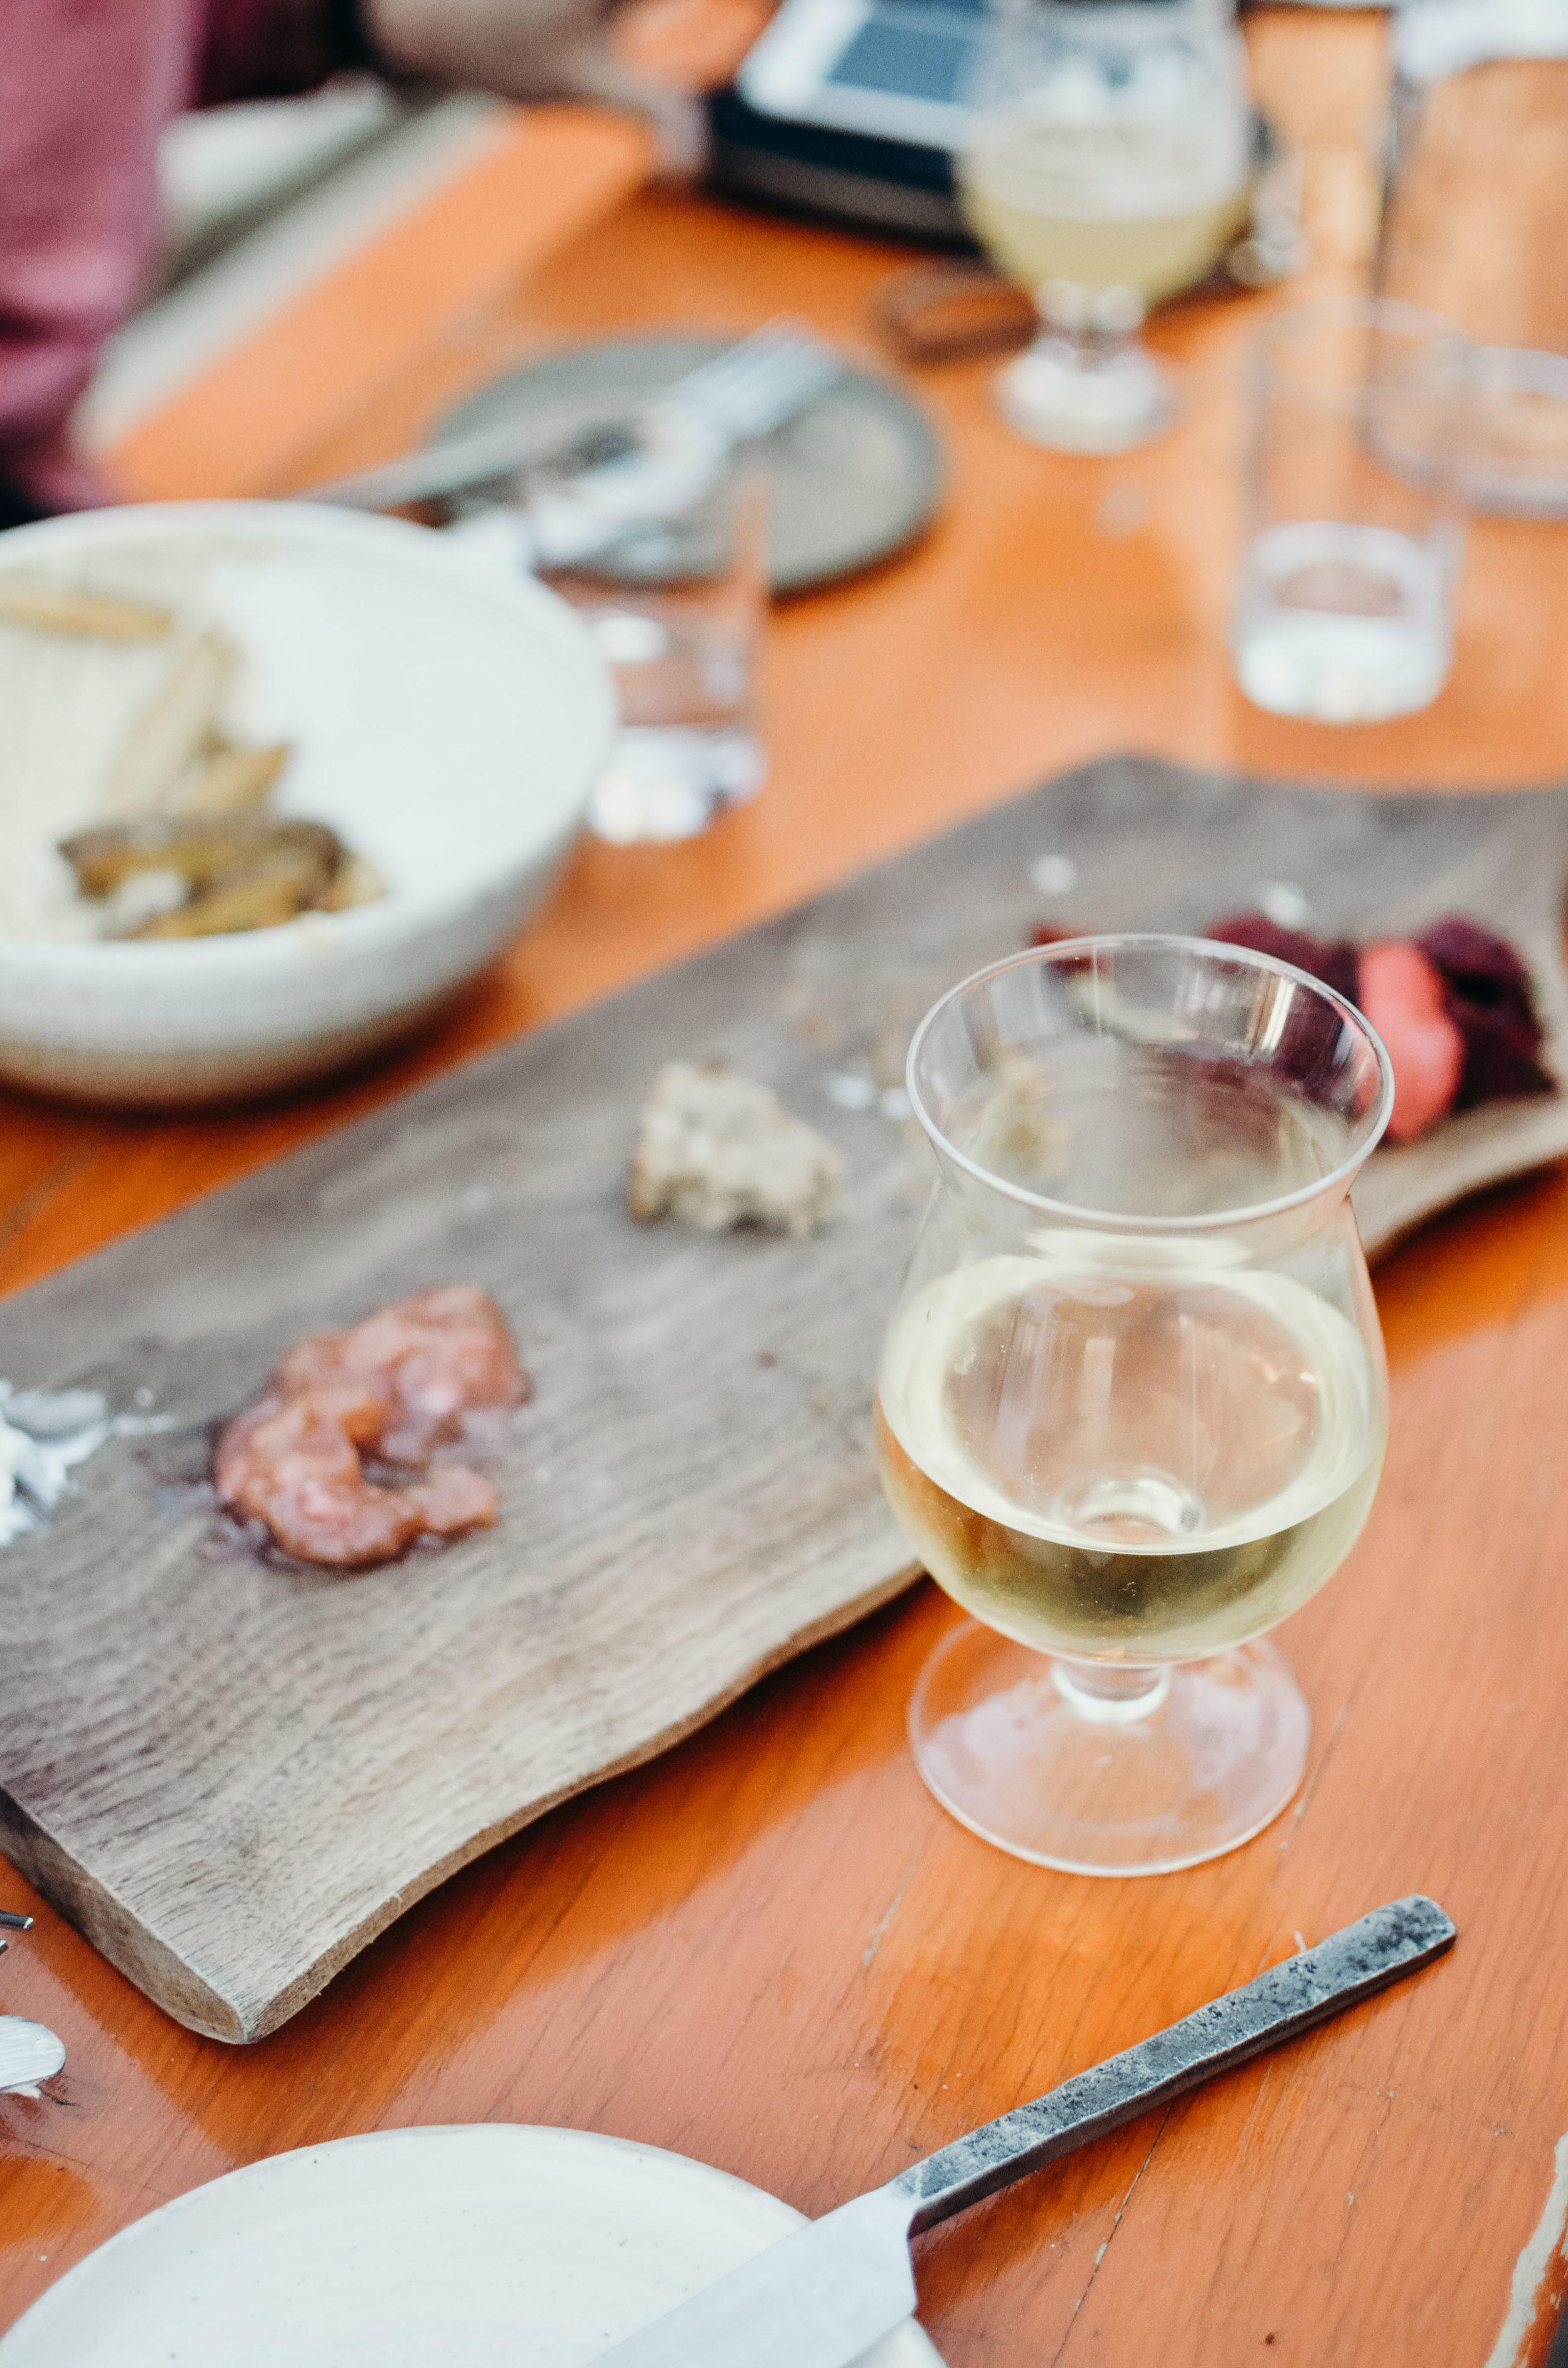 Wendling_Boyd_The_Sovengard_Dinner_With_Loved_Ones-3.jpg